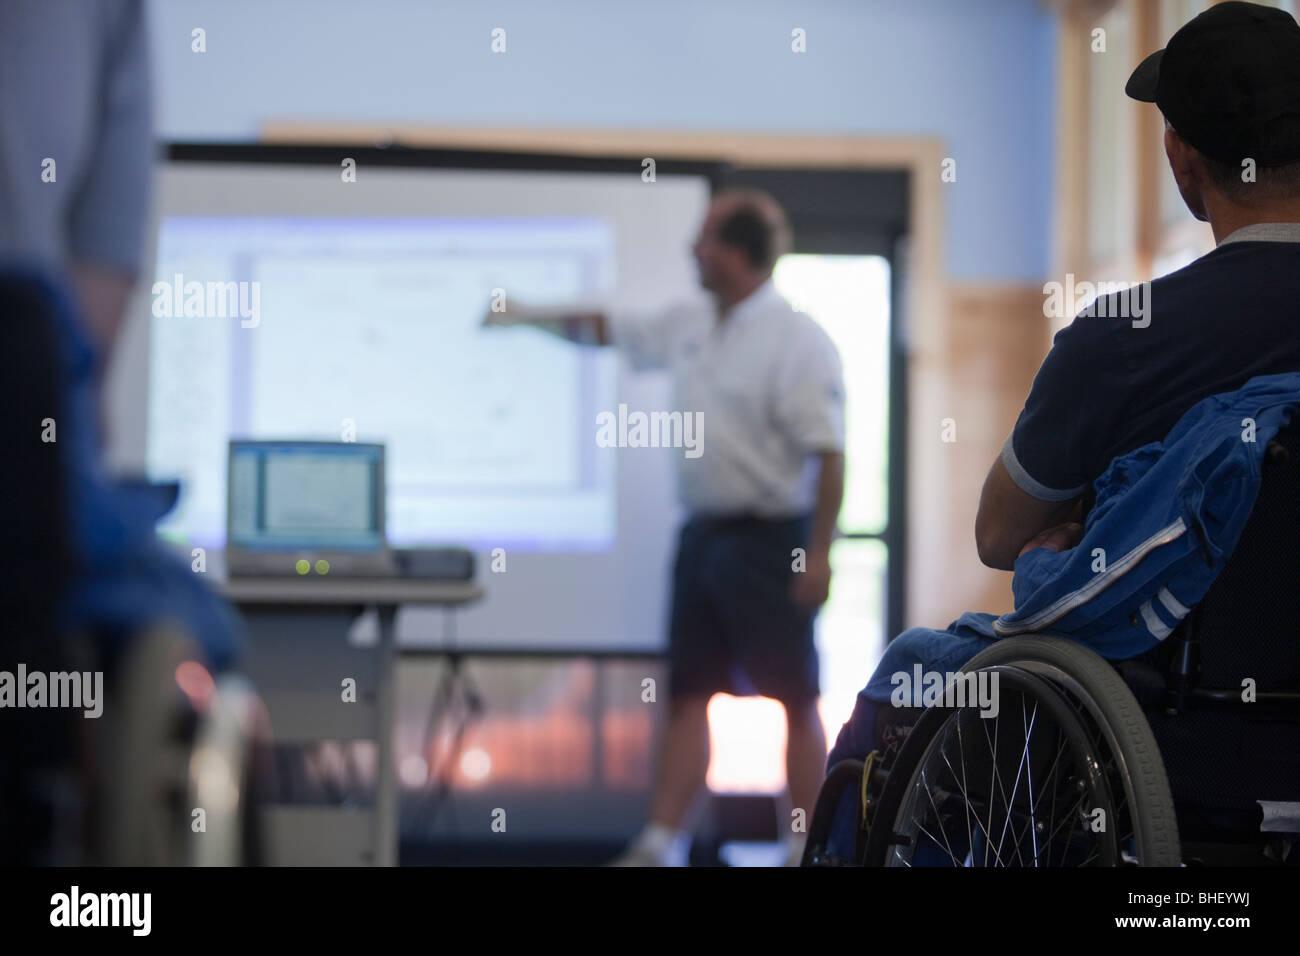 Behinderung Sport training Klasse Stockbild